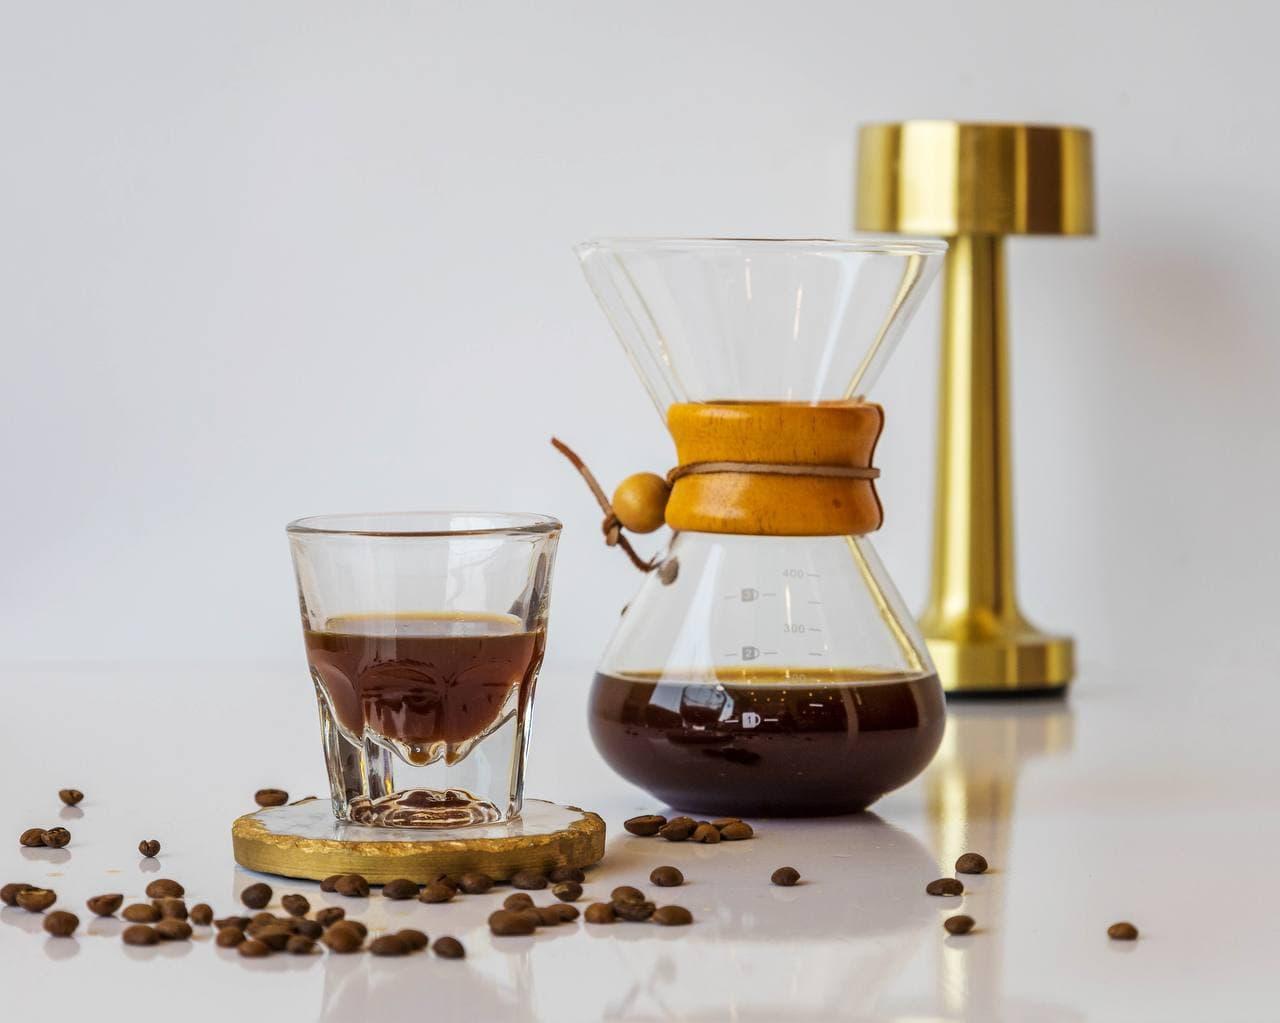 chemex BREW COFFEE FILTER